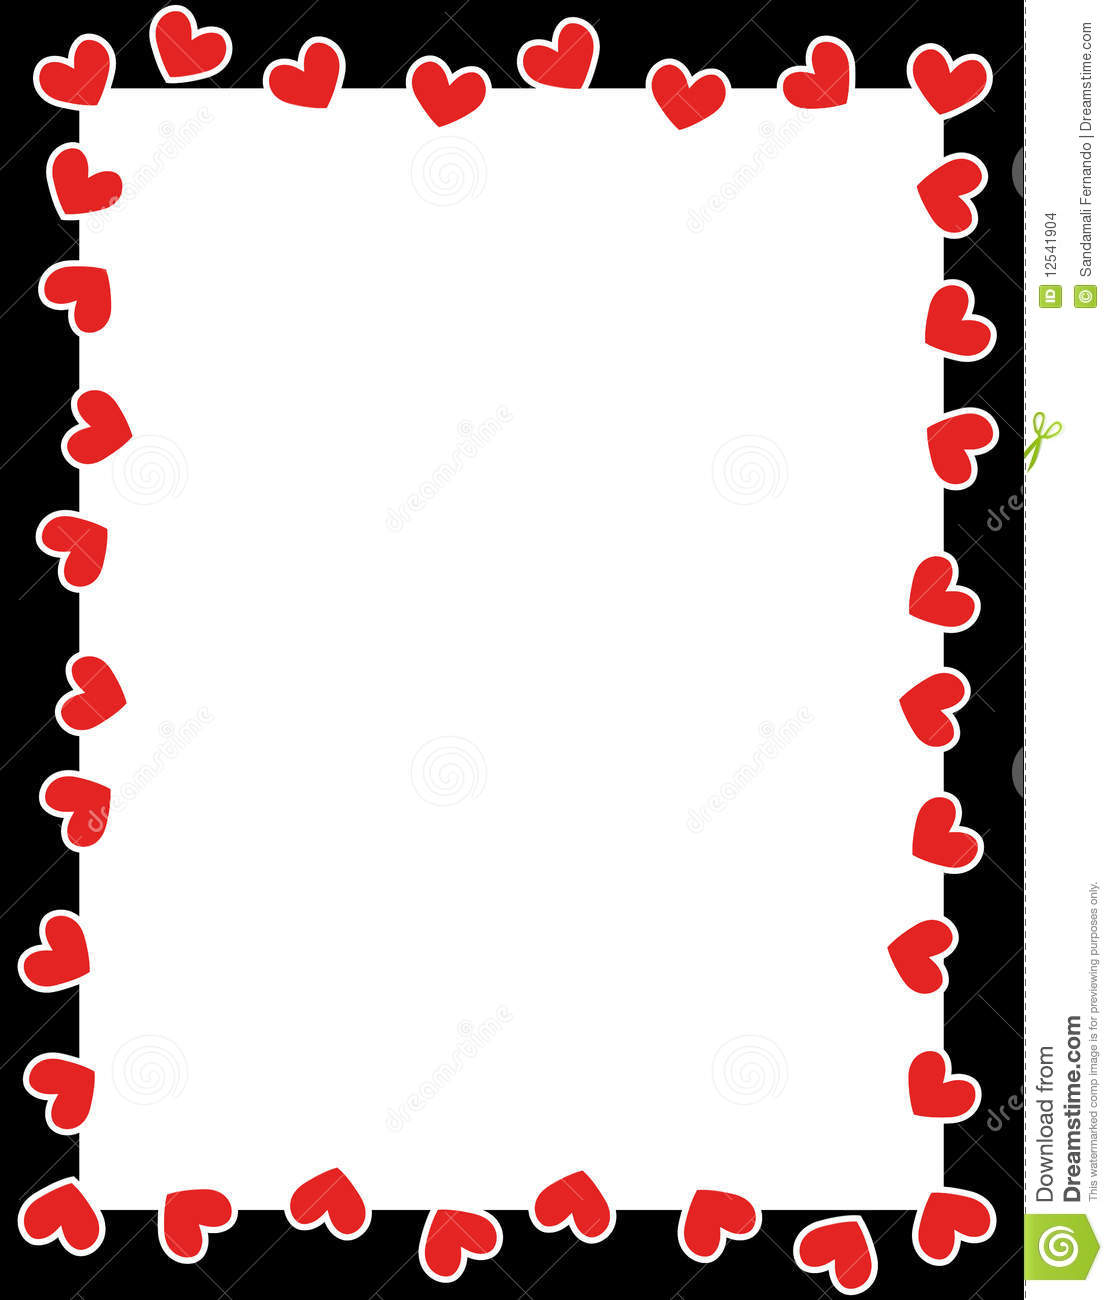 Clip art, Valentines day . - Valentines Day Borders Clip Art